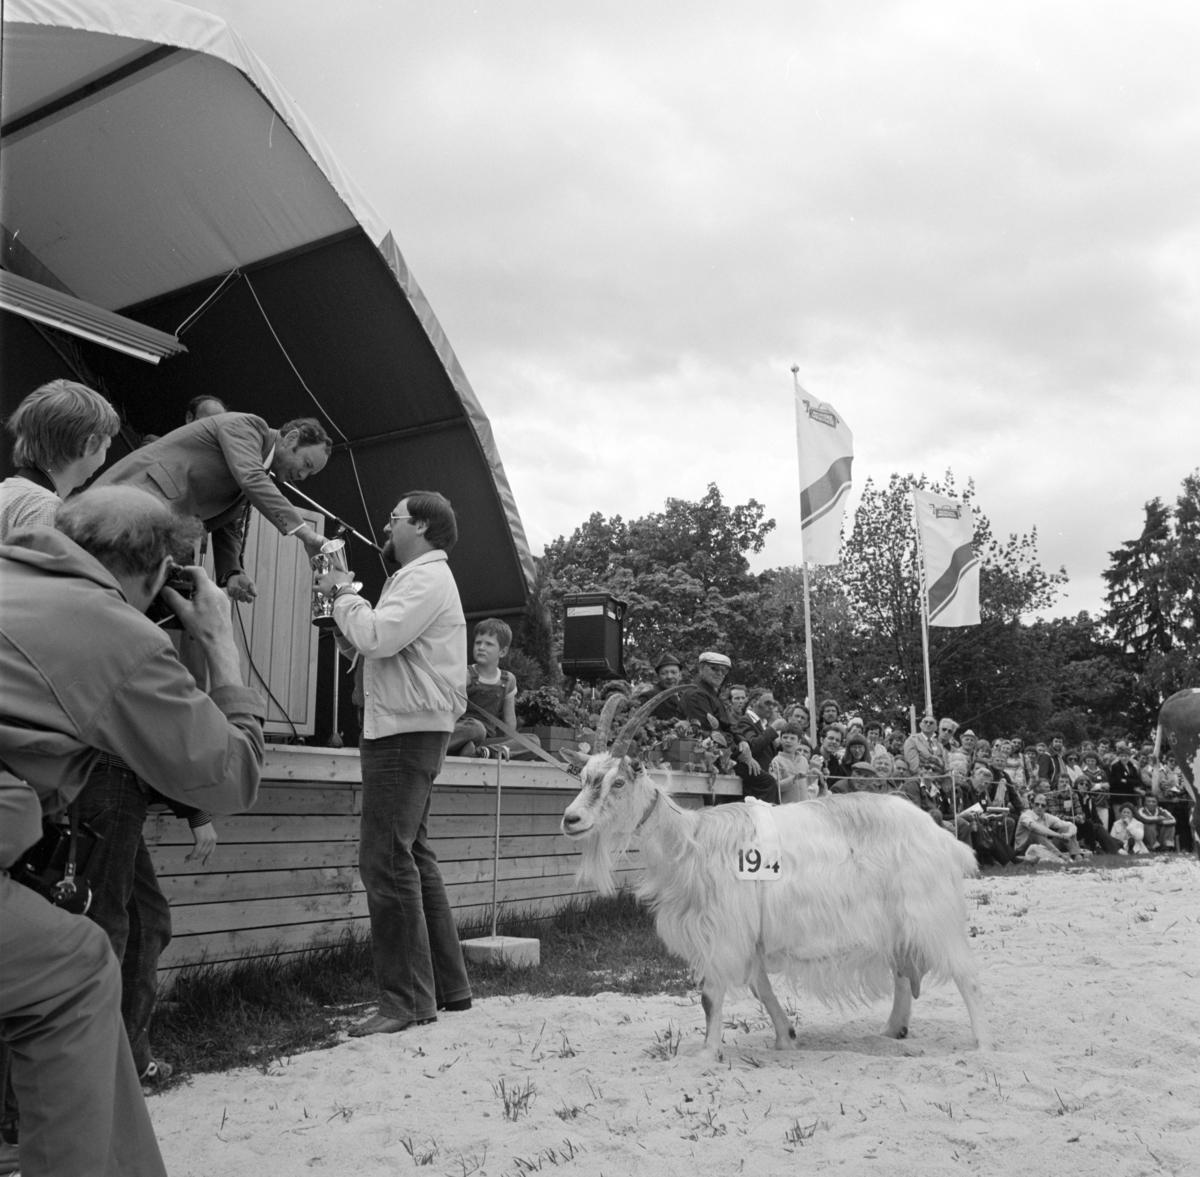 Norske Melkeprodusenters Landsforbund, NML 100 år 1881-1981. Jubileumsutstilling,visningsring, kavalkade over norsk husdyrhold, premiering,geitebukk,Domkirkeodden, Hamar.